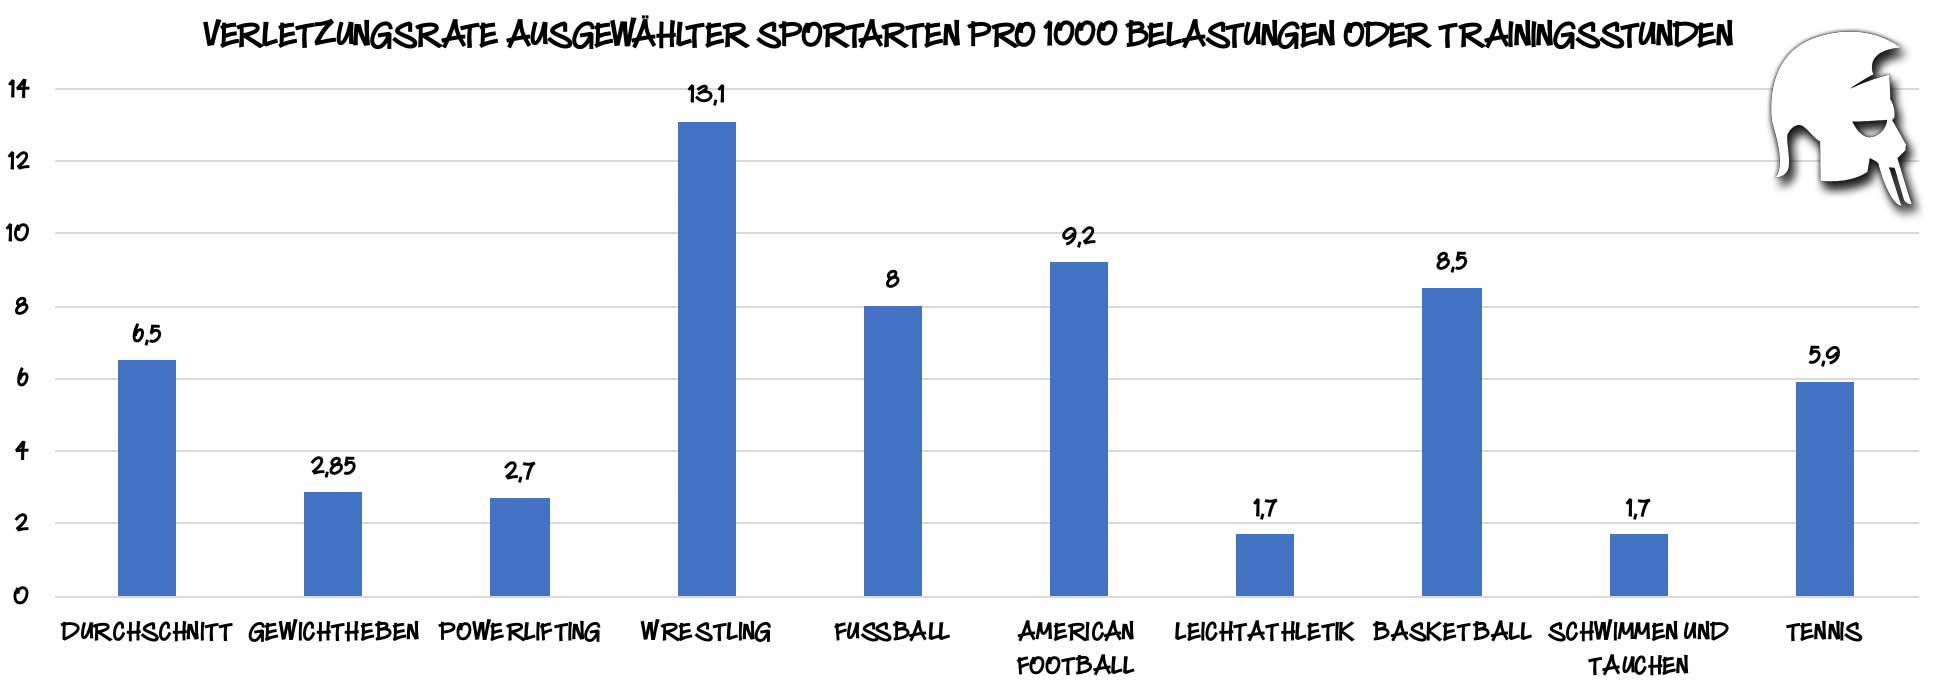 Verletzungsrate ausgewählter Sportarten